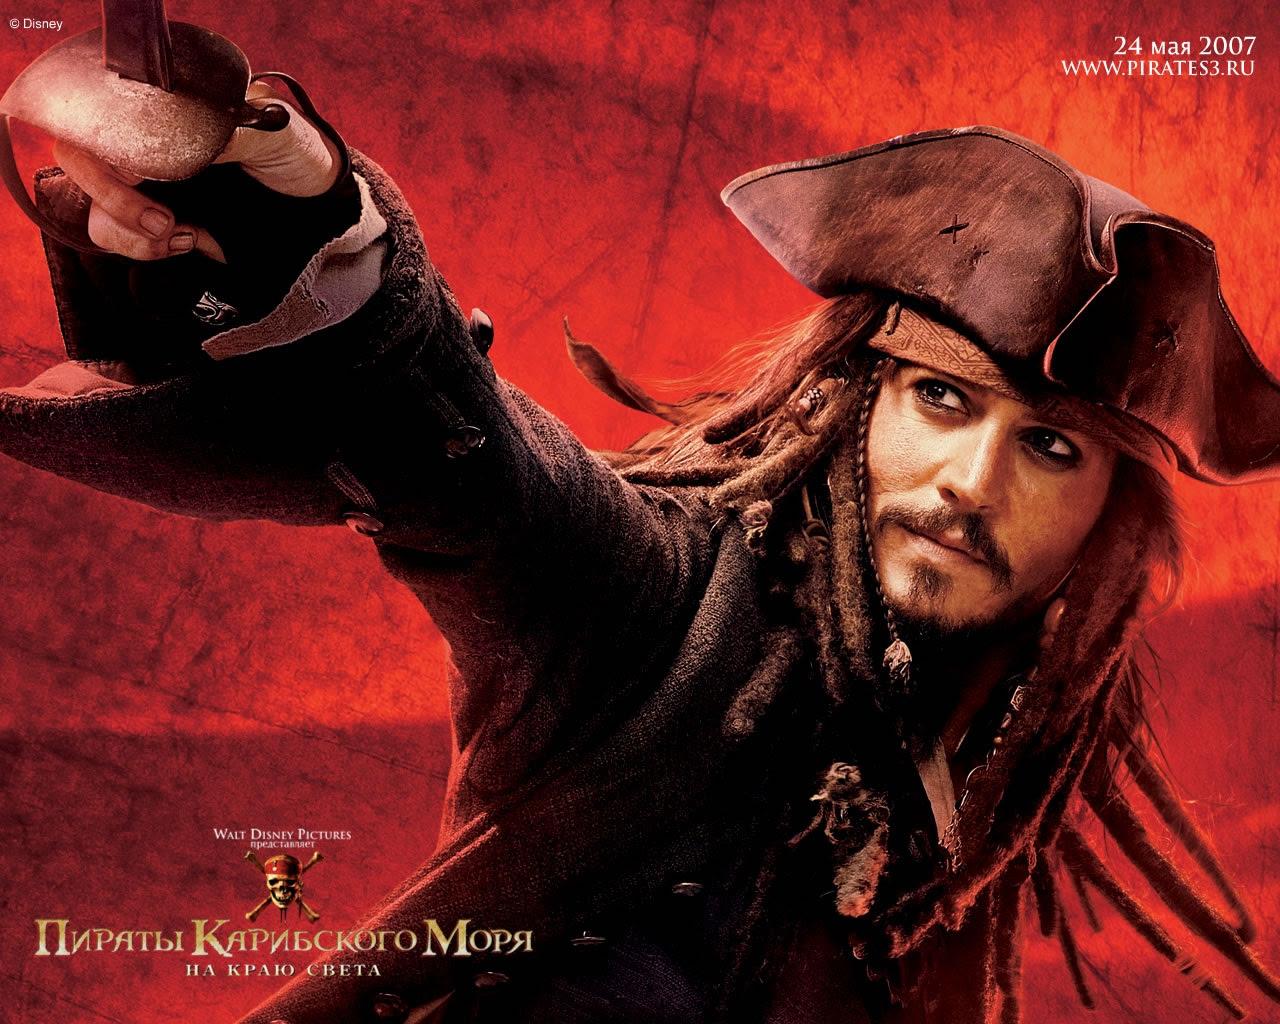 Jack Sparrow 壁紙 ジャック スパロウ 壁紙 30438298 ファンポップ